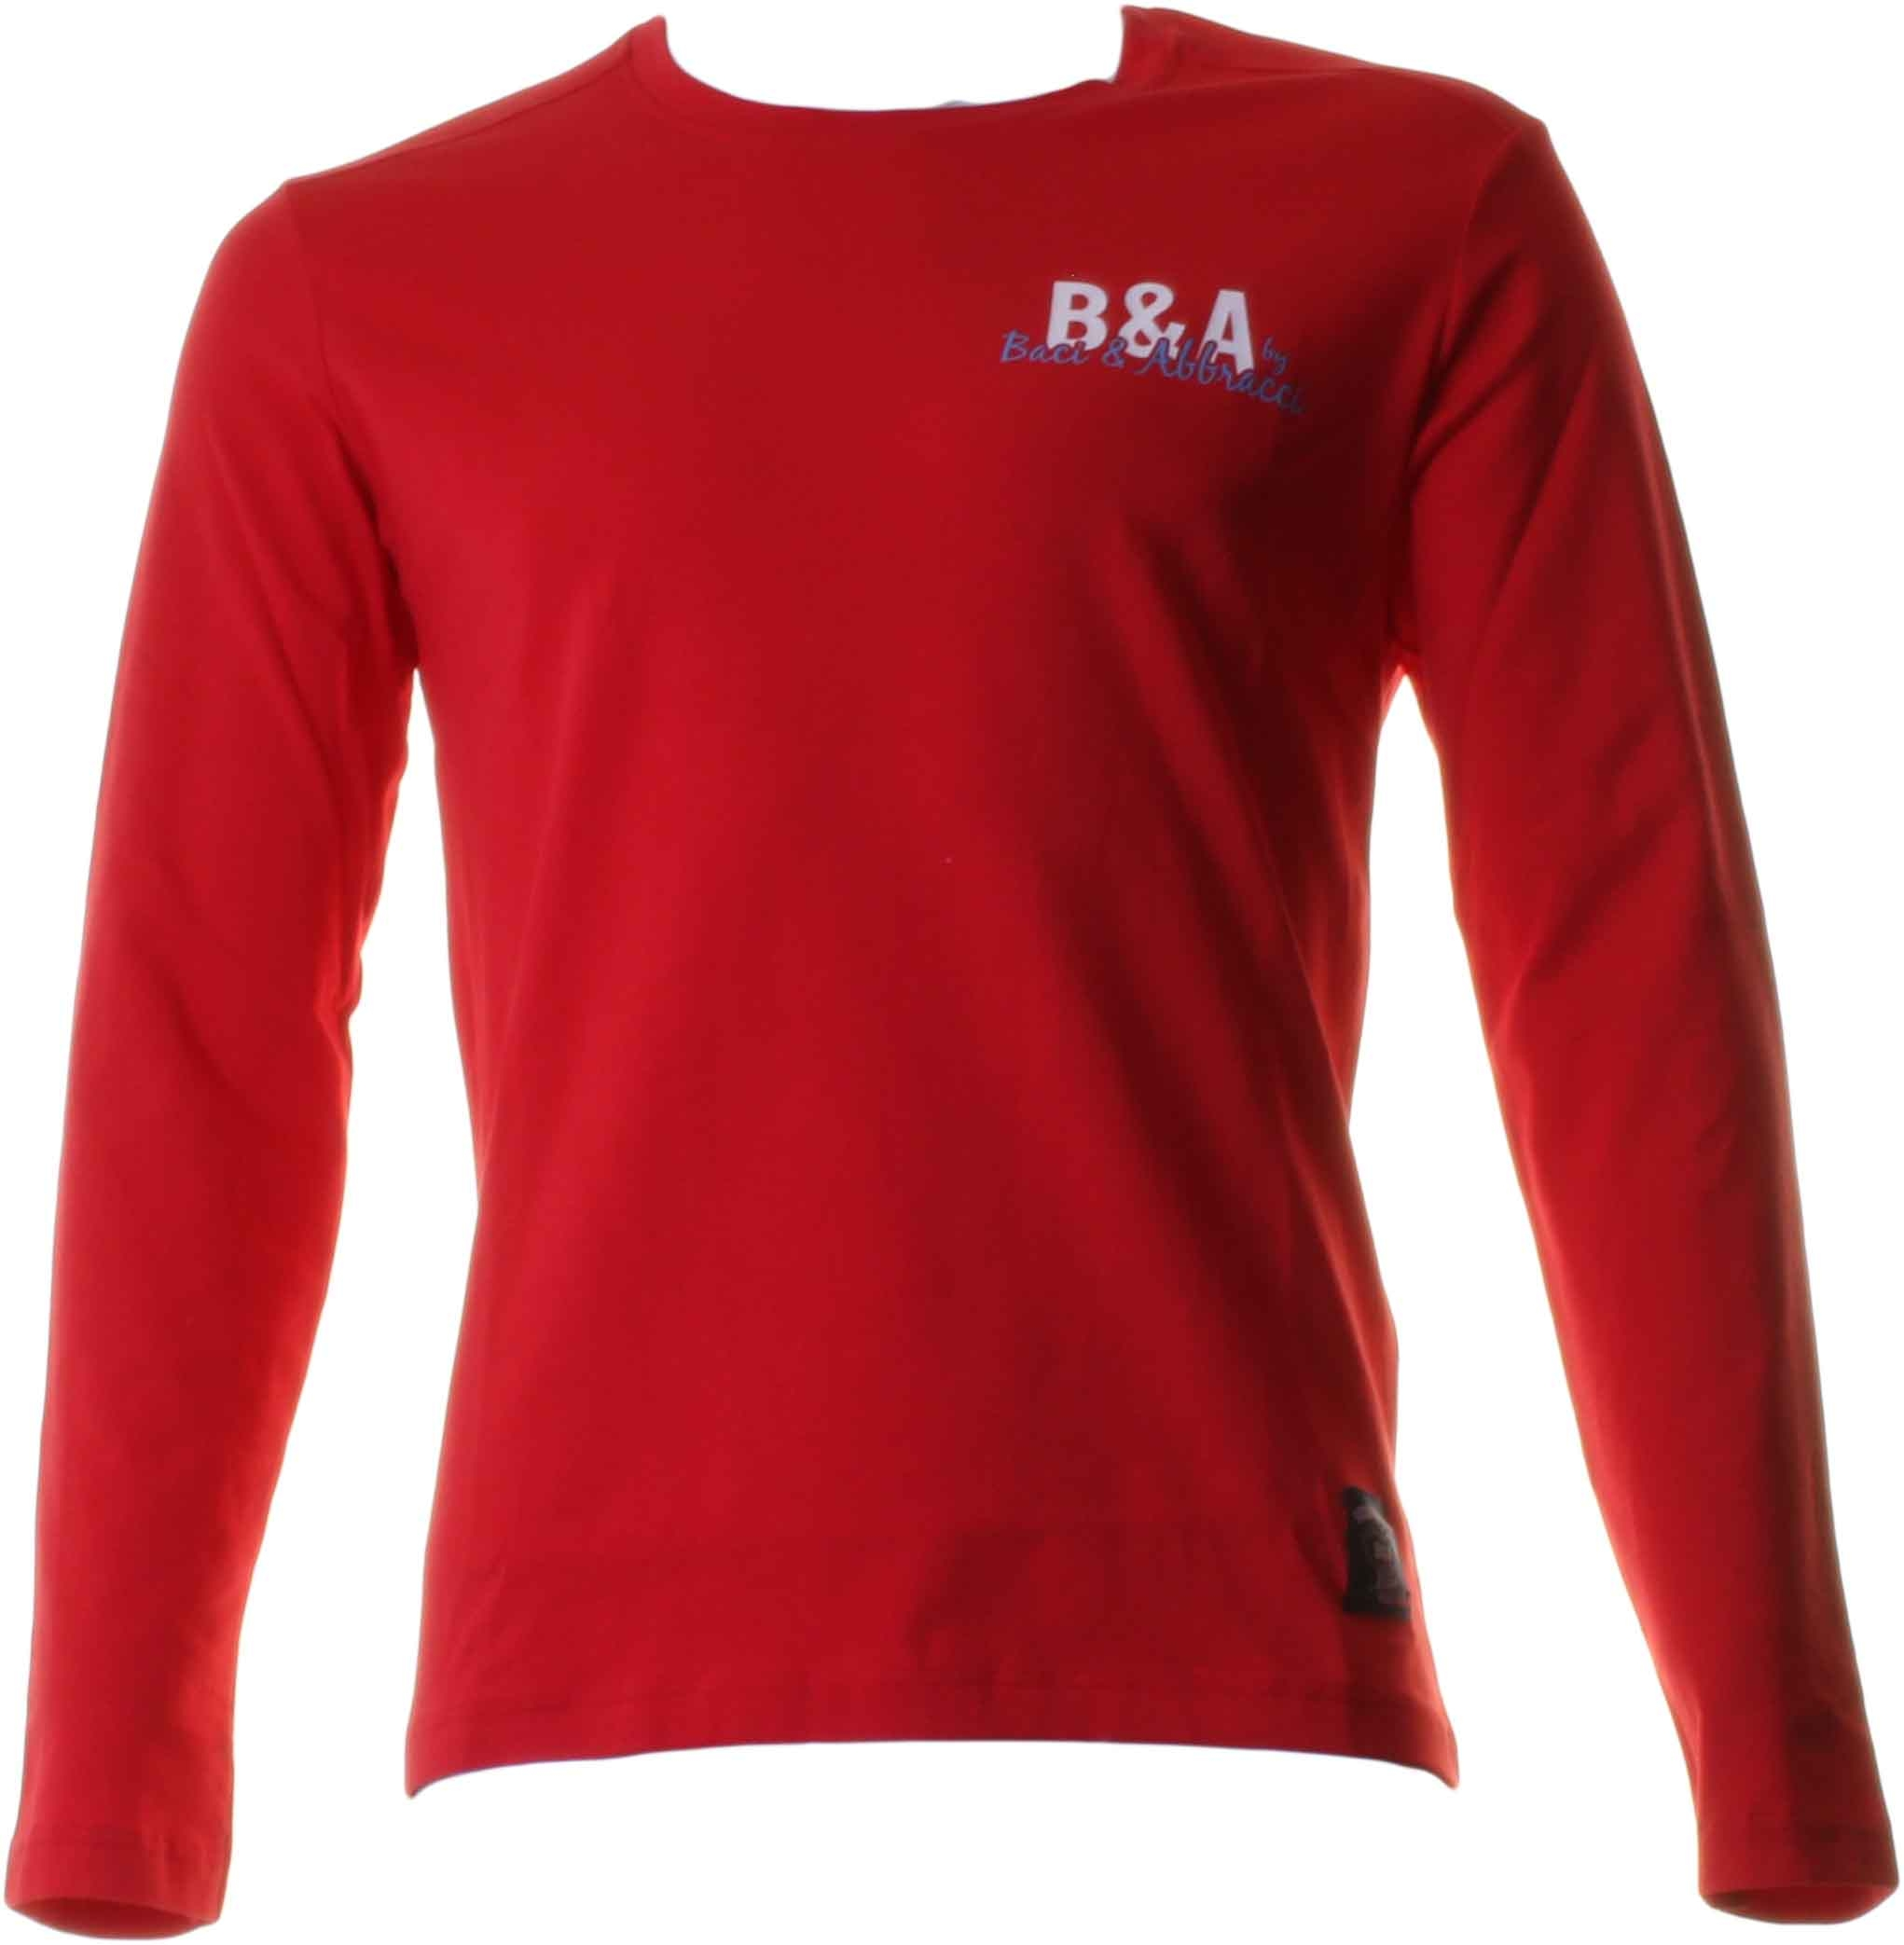 Acquista T-shirt Girocollo Maniche Lunghe 17535153 | Glooke.com